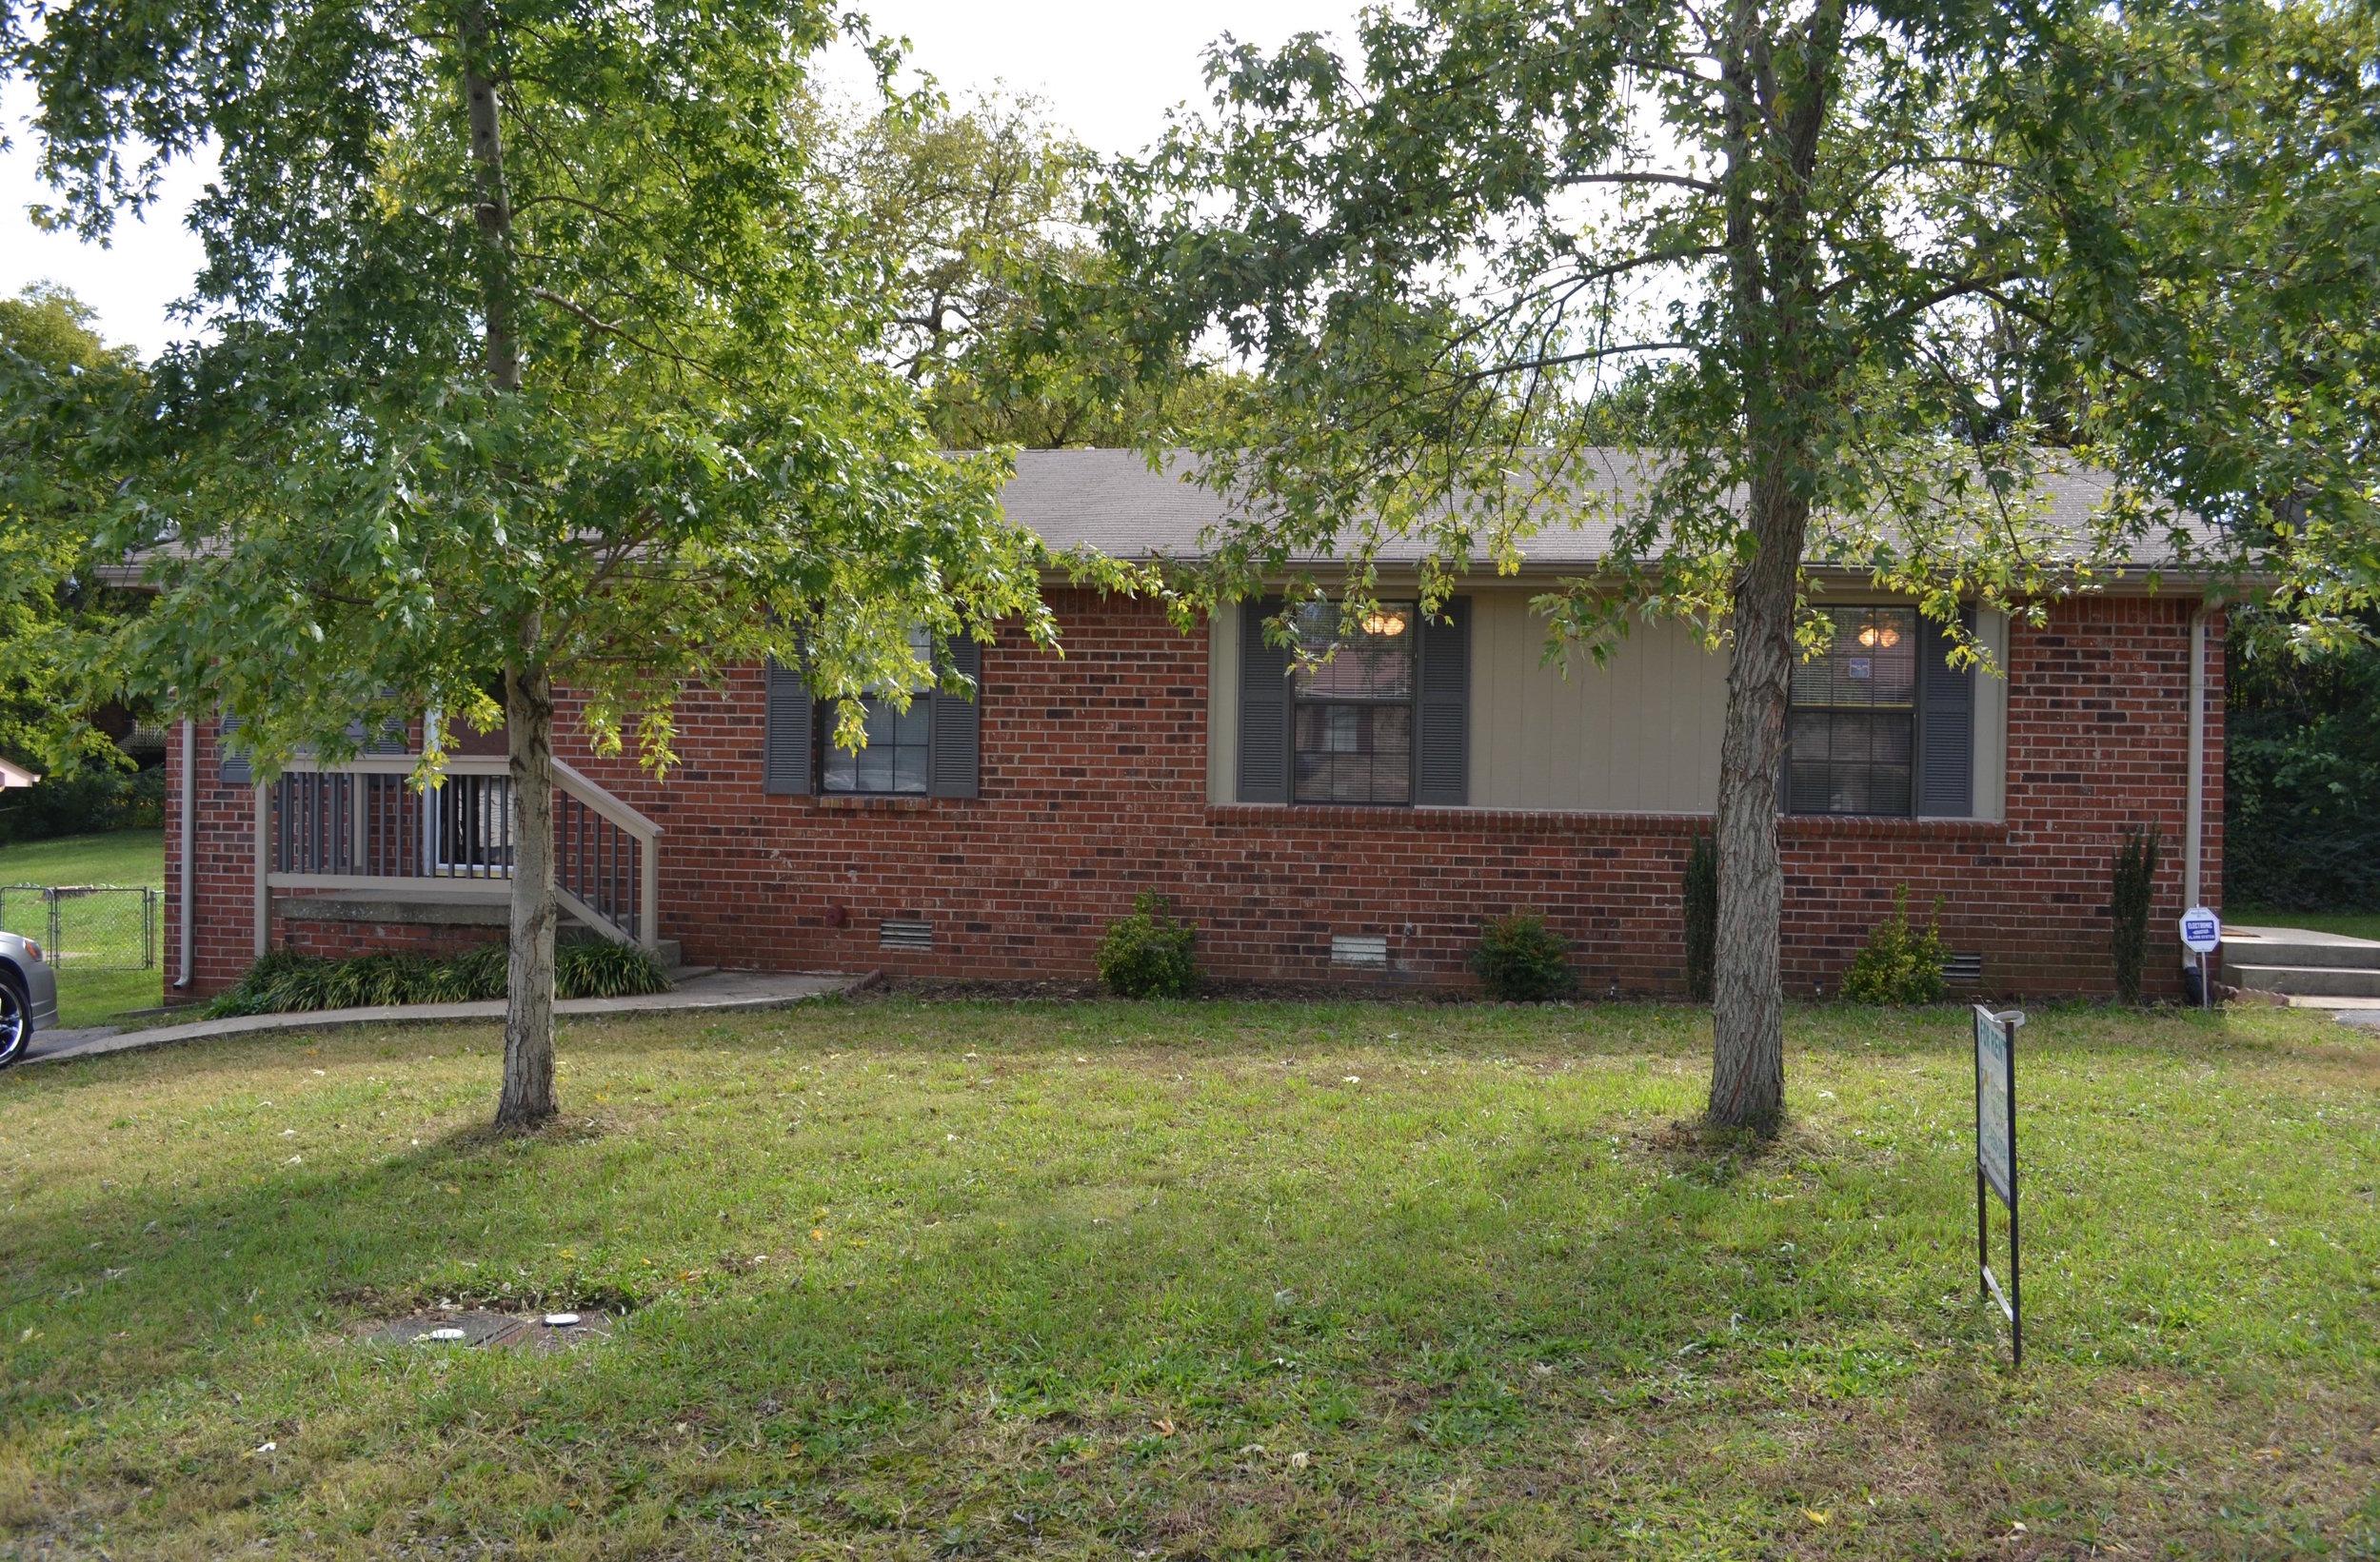 1160 /1162 RENTED  MADISON: 1160/62 Sioux Terrace: Duplex: 2 Br, 1 Ba